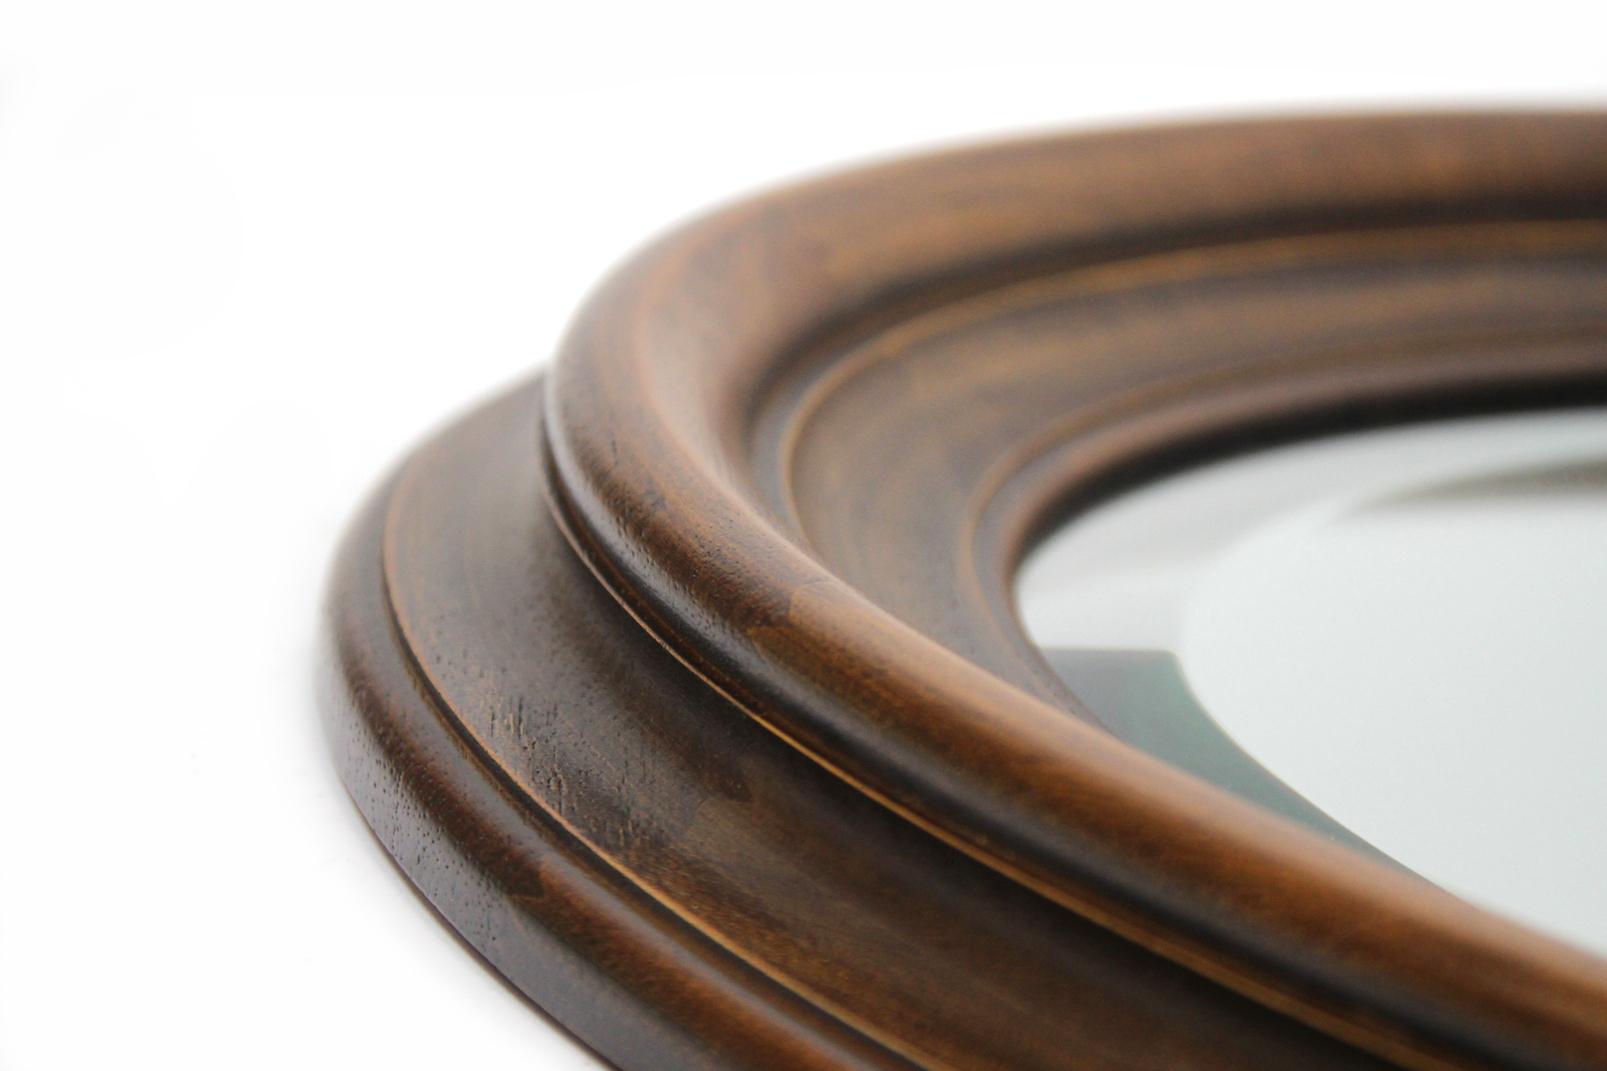 spiegel im art deco stil oval 87 x 67 cm massiv holz rahmen facetten schliff ebay. Black Bedroom Furniture Sets. Home Design Ideas